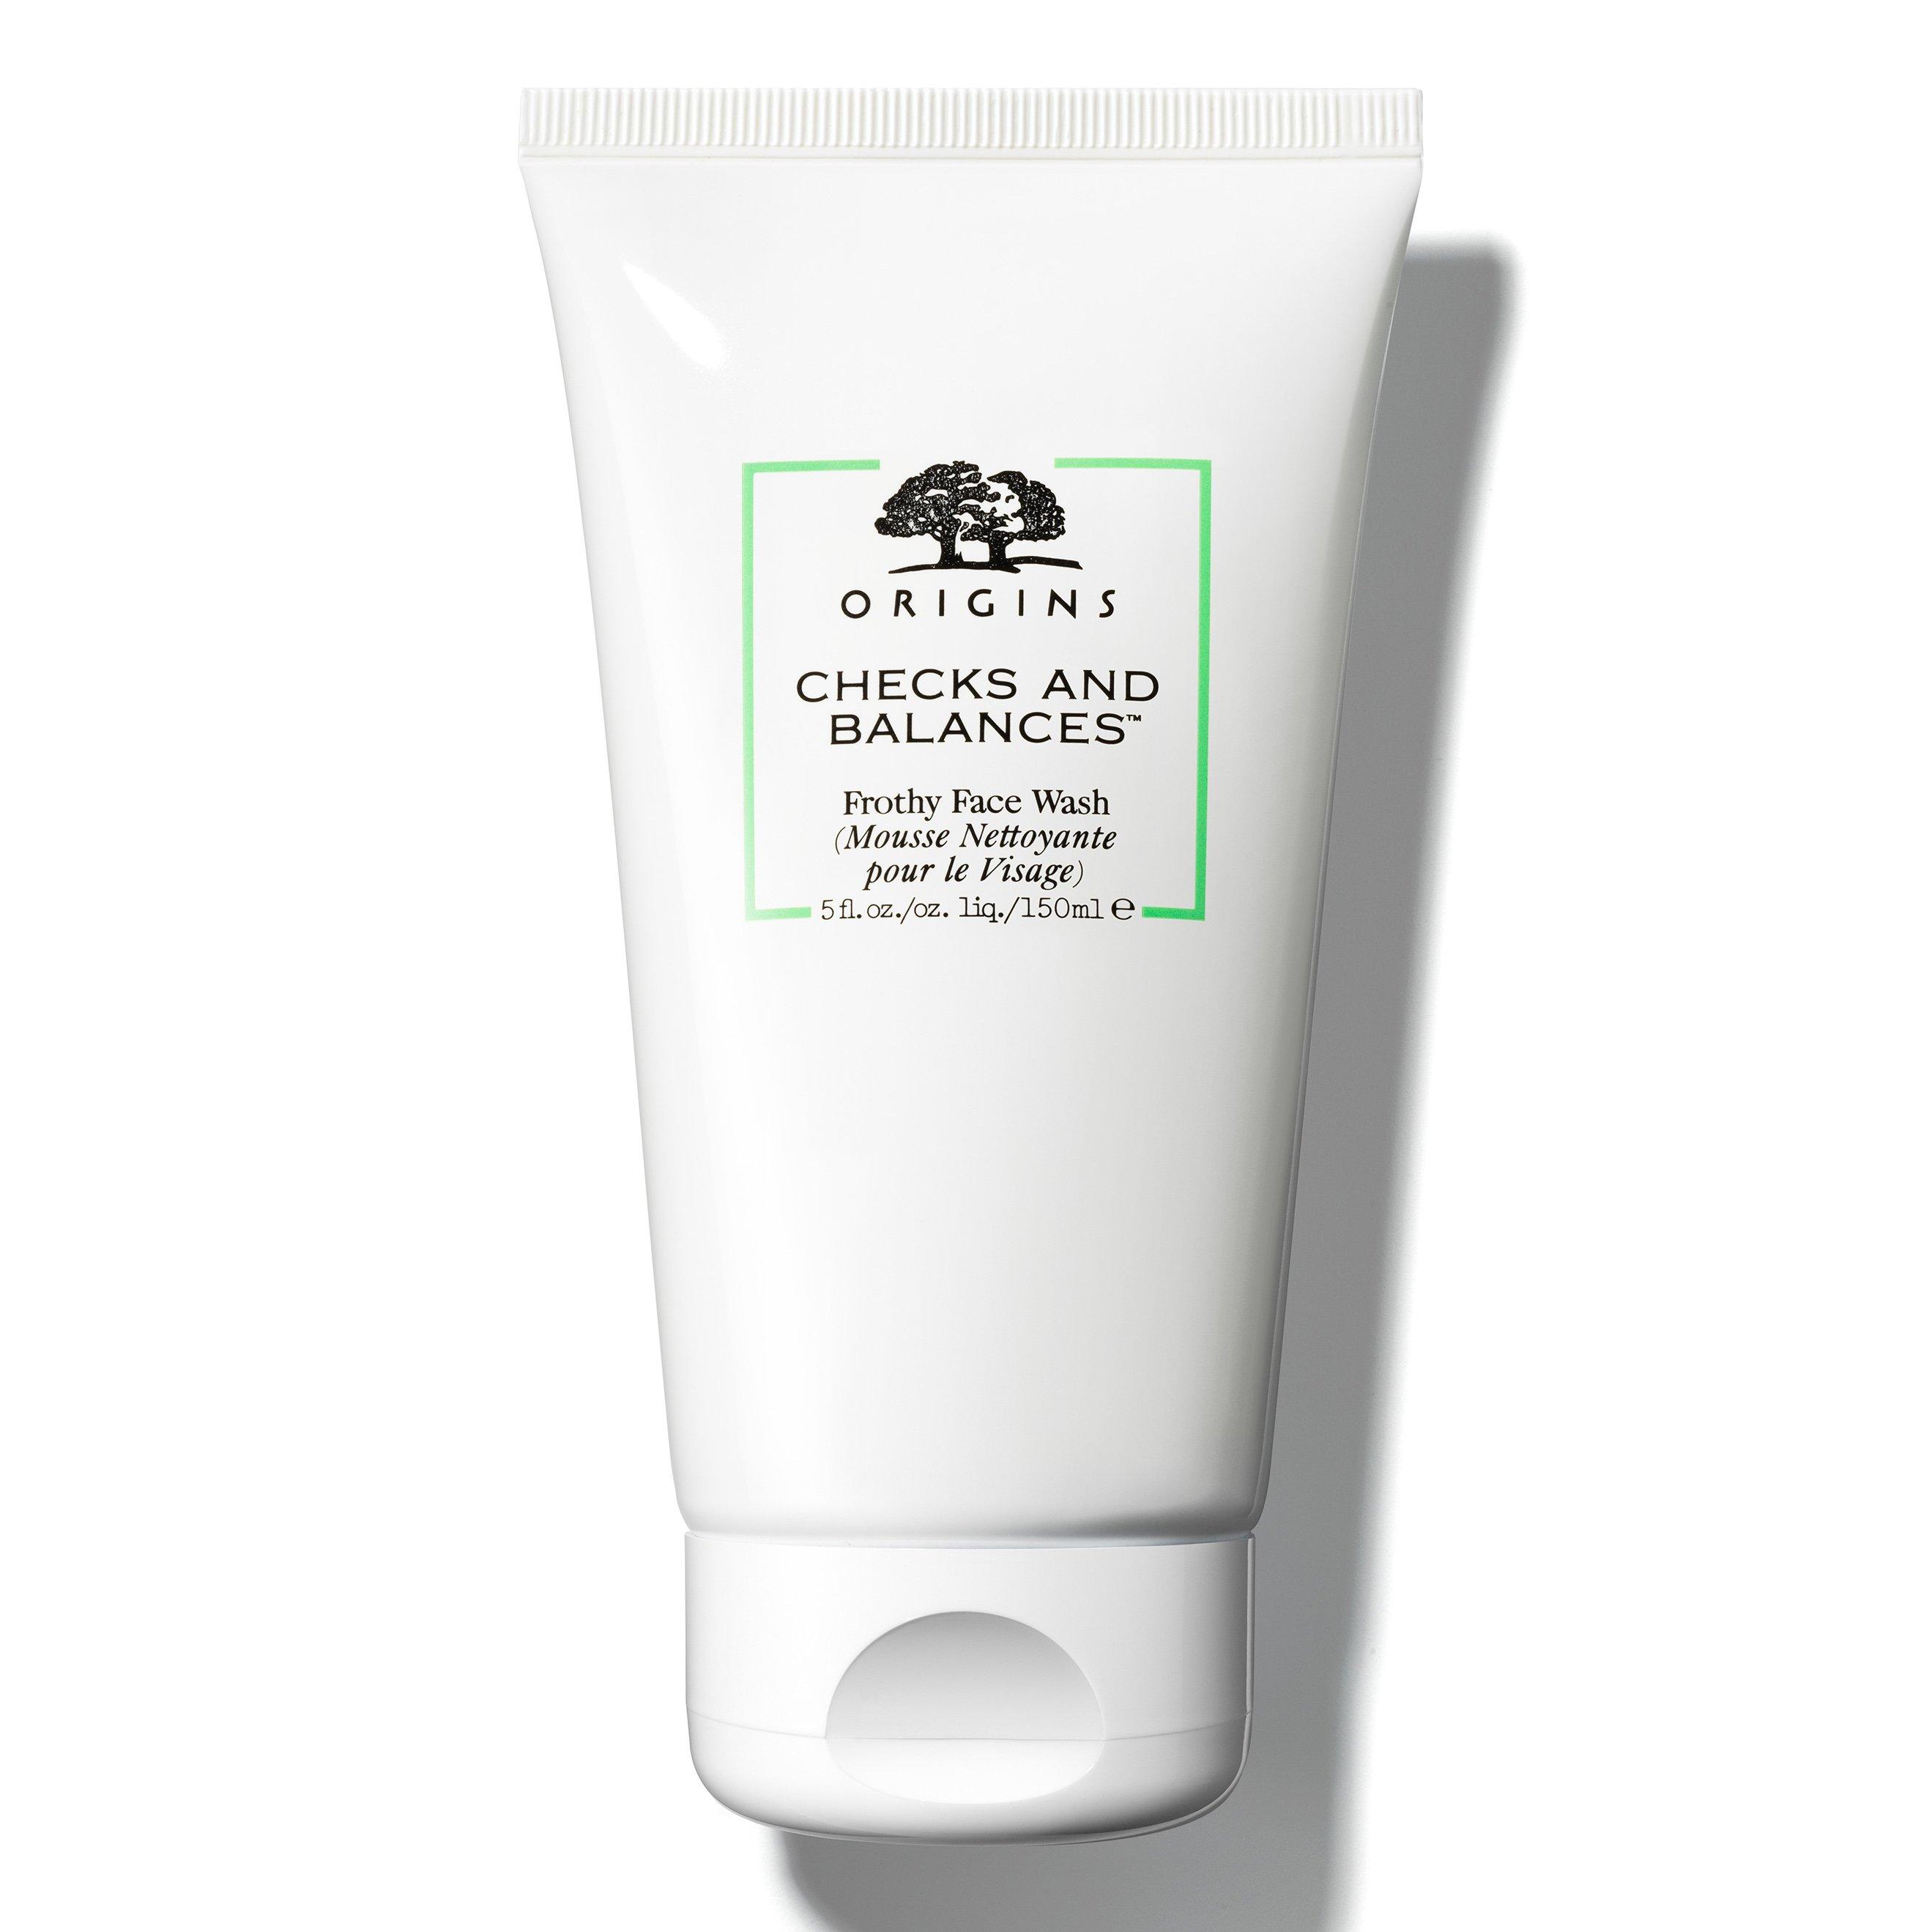 Origins Checks And Balances Frothy Face Wash Απαλό, Αφρώδες Καθαριστικό Προσώπου για Αίσθηση Φρεσκάδας 150ml